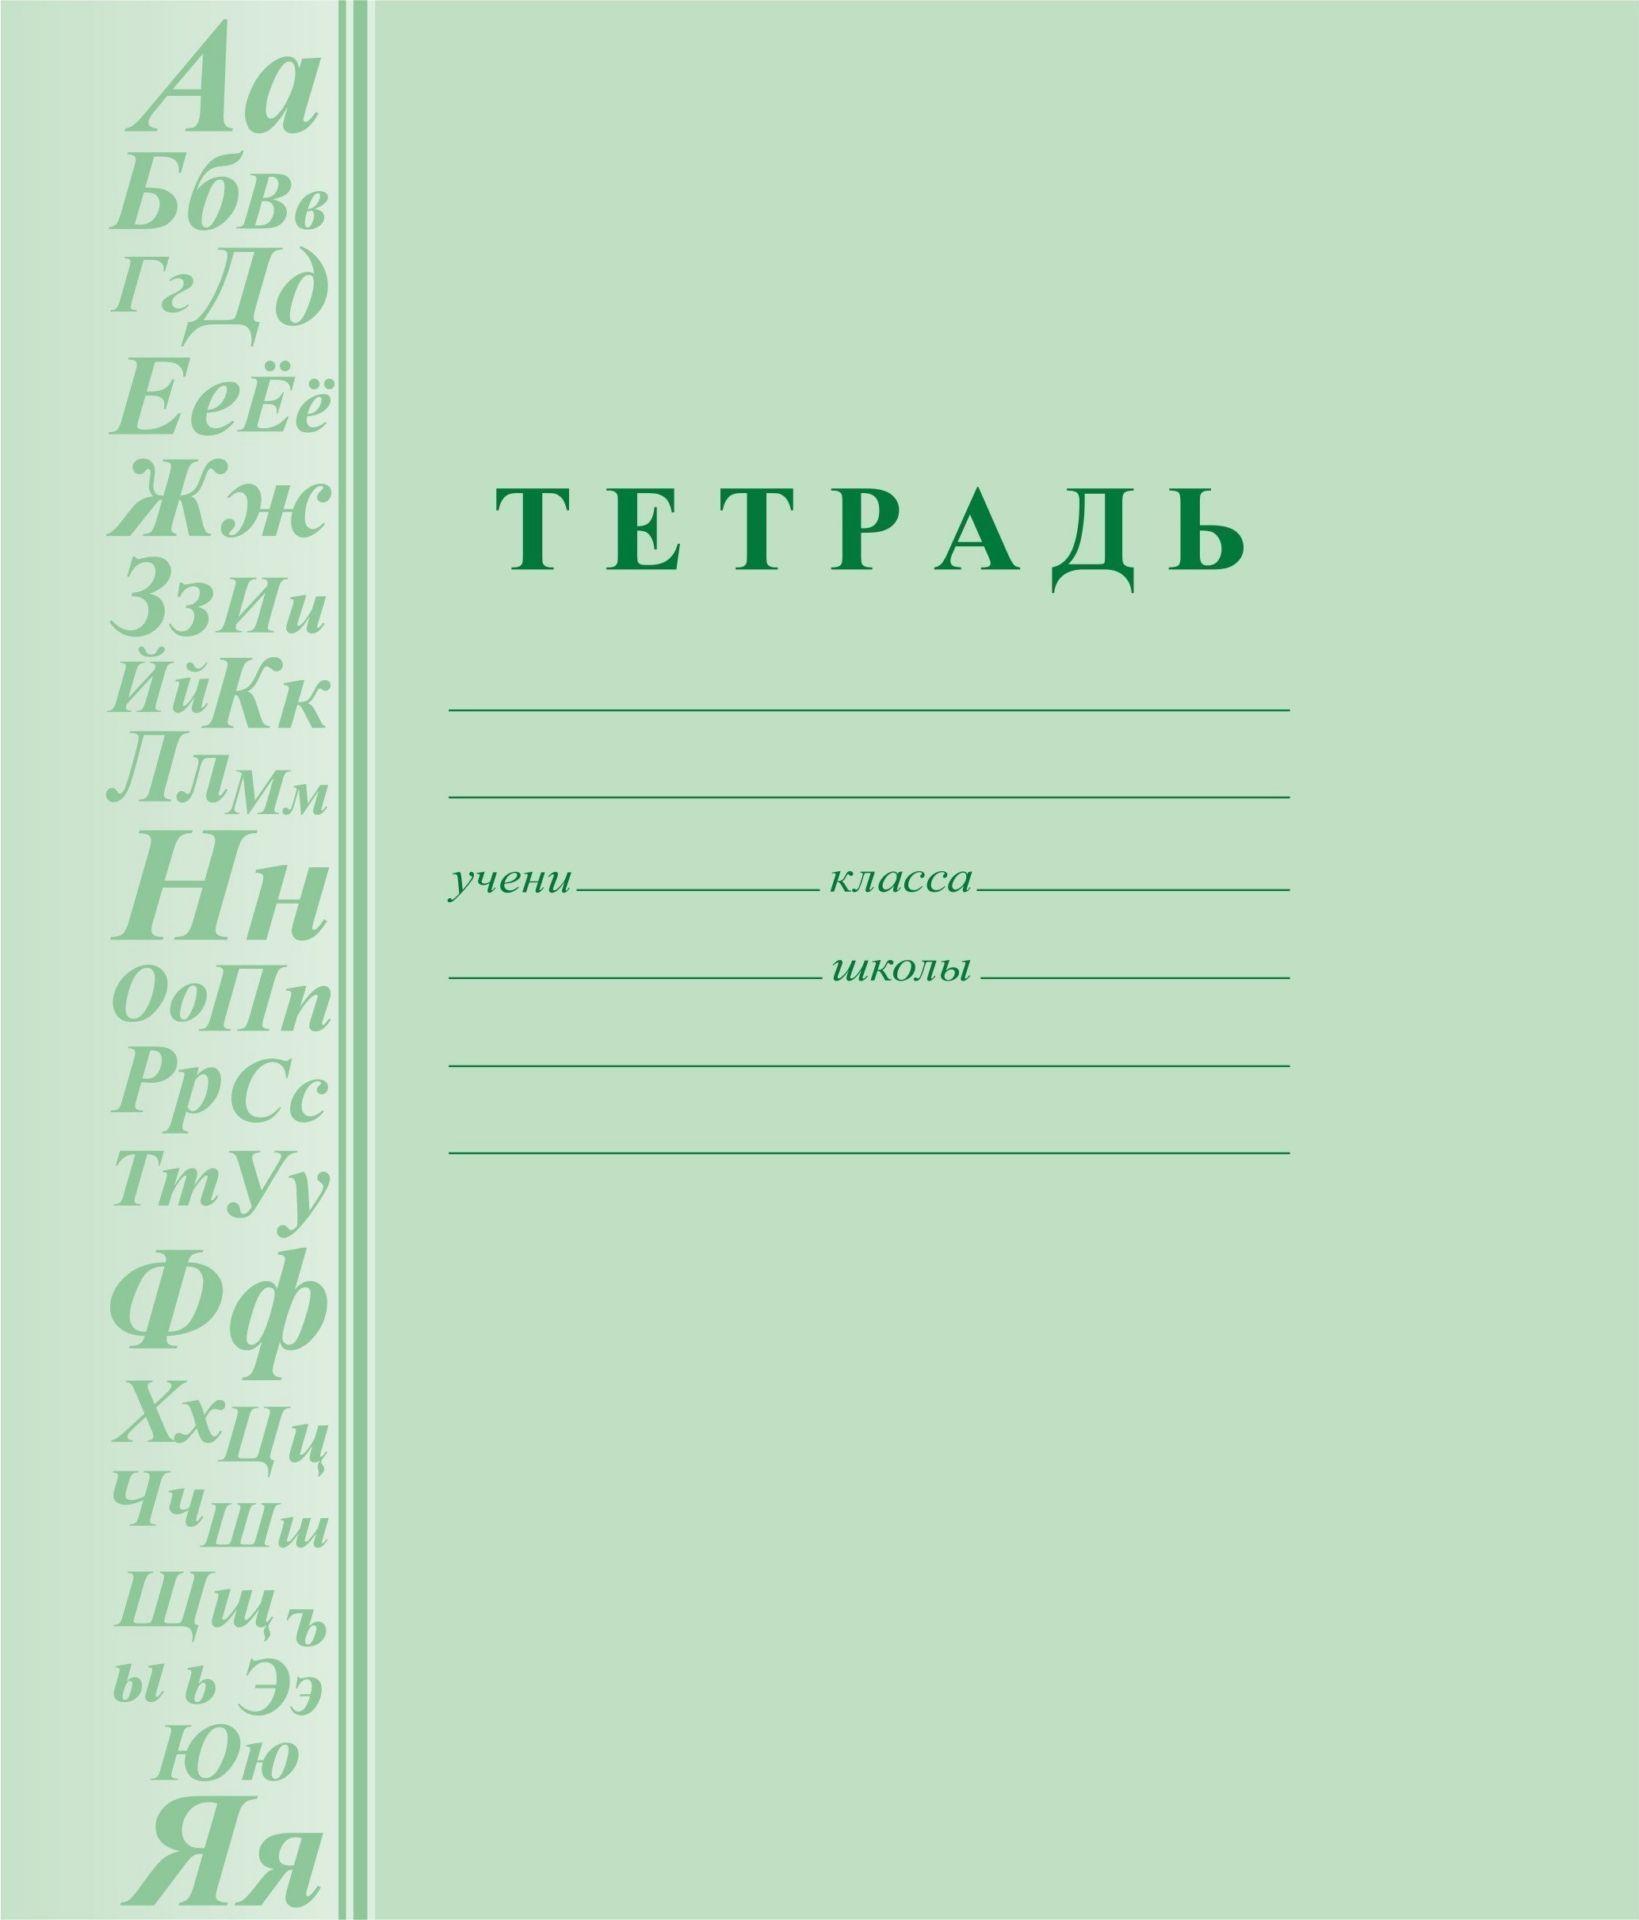 Тетрадь по русскому языку (с грамматикой)24 листа<br>.<br><br>Год: 2017<br>Высота: 205<br>Ширина: 165<br>Толщина: 1<br>Переплёт: мягкая, скрепка